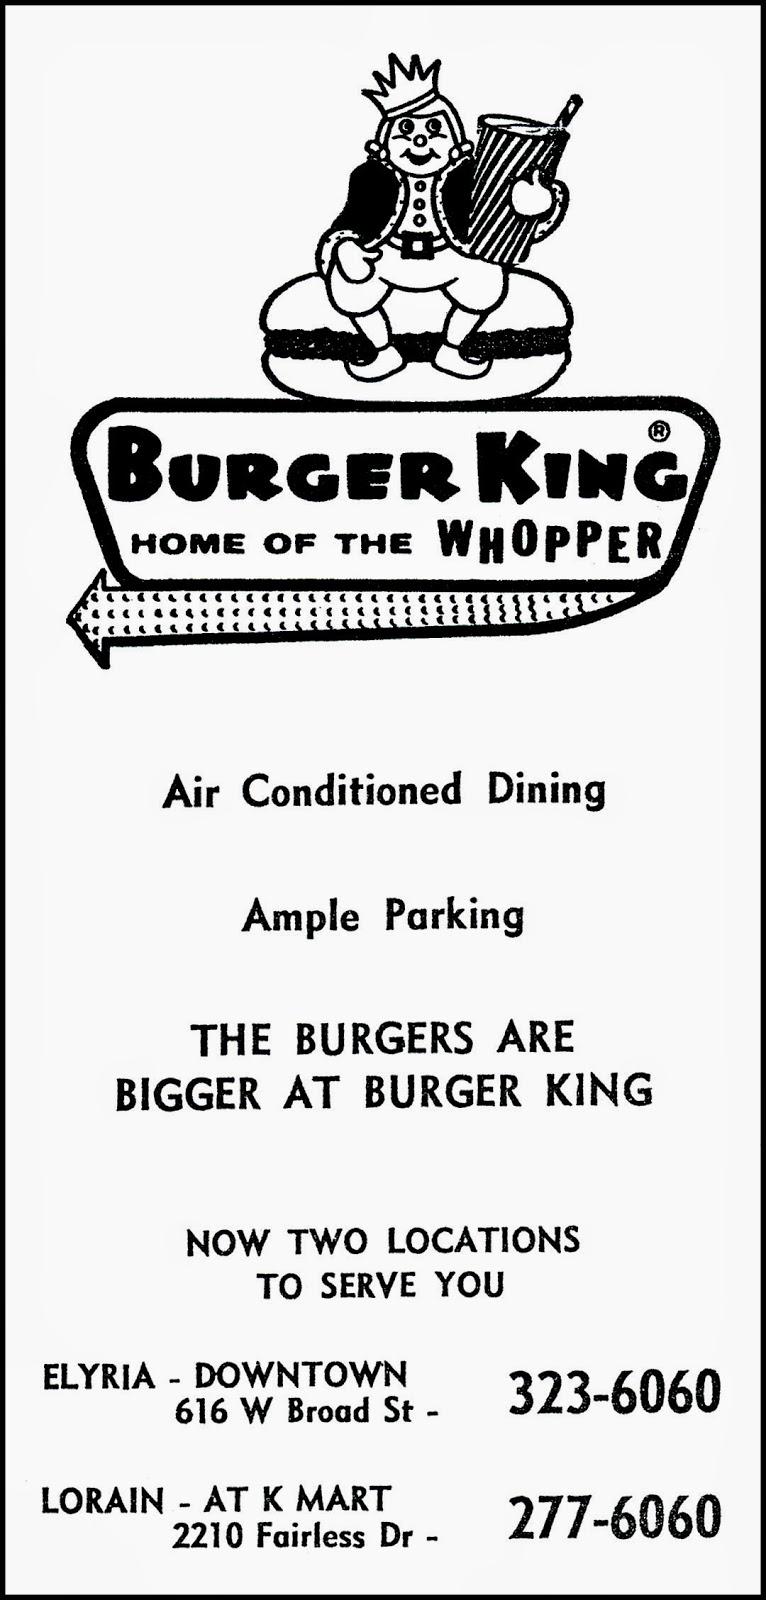 Restaurants Italian Near Me: Brady's Bunch Of Lorain County Nostalgia: 1969 Burger King